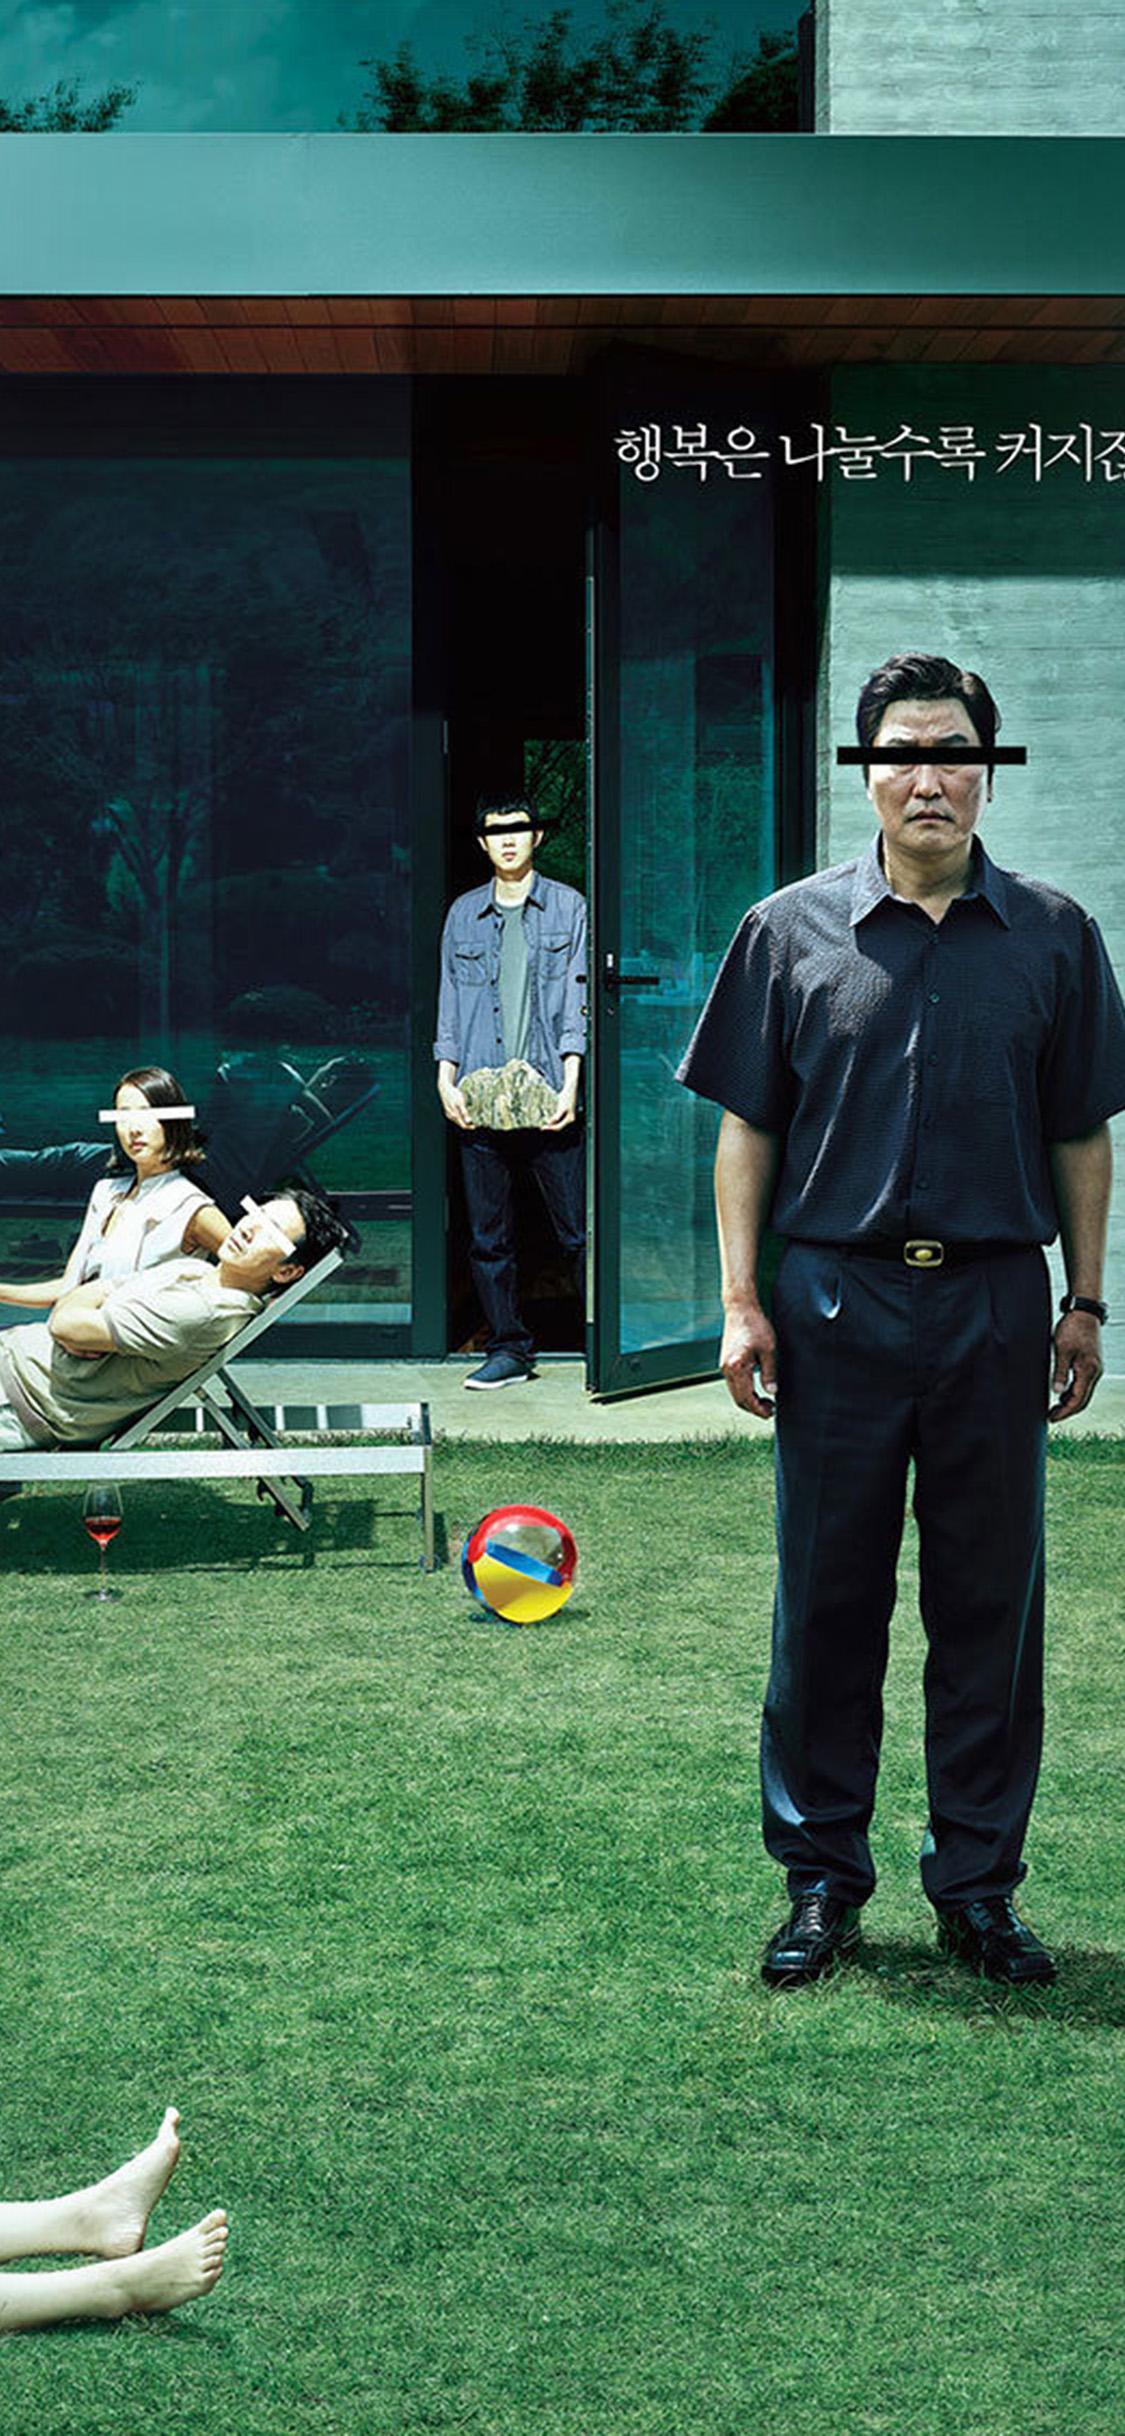 iPhonexpapers.com-Apple-iPhone-wallpaper-bk51-art-parasite-poster-film